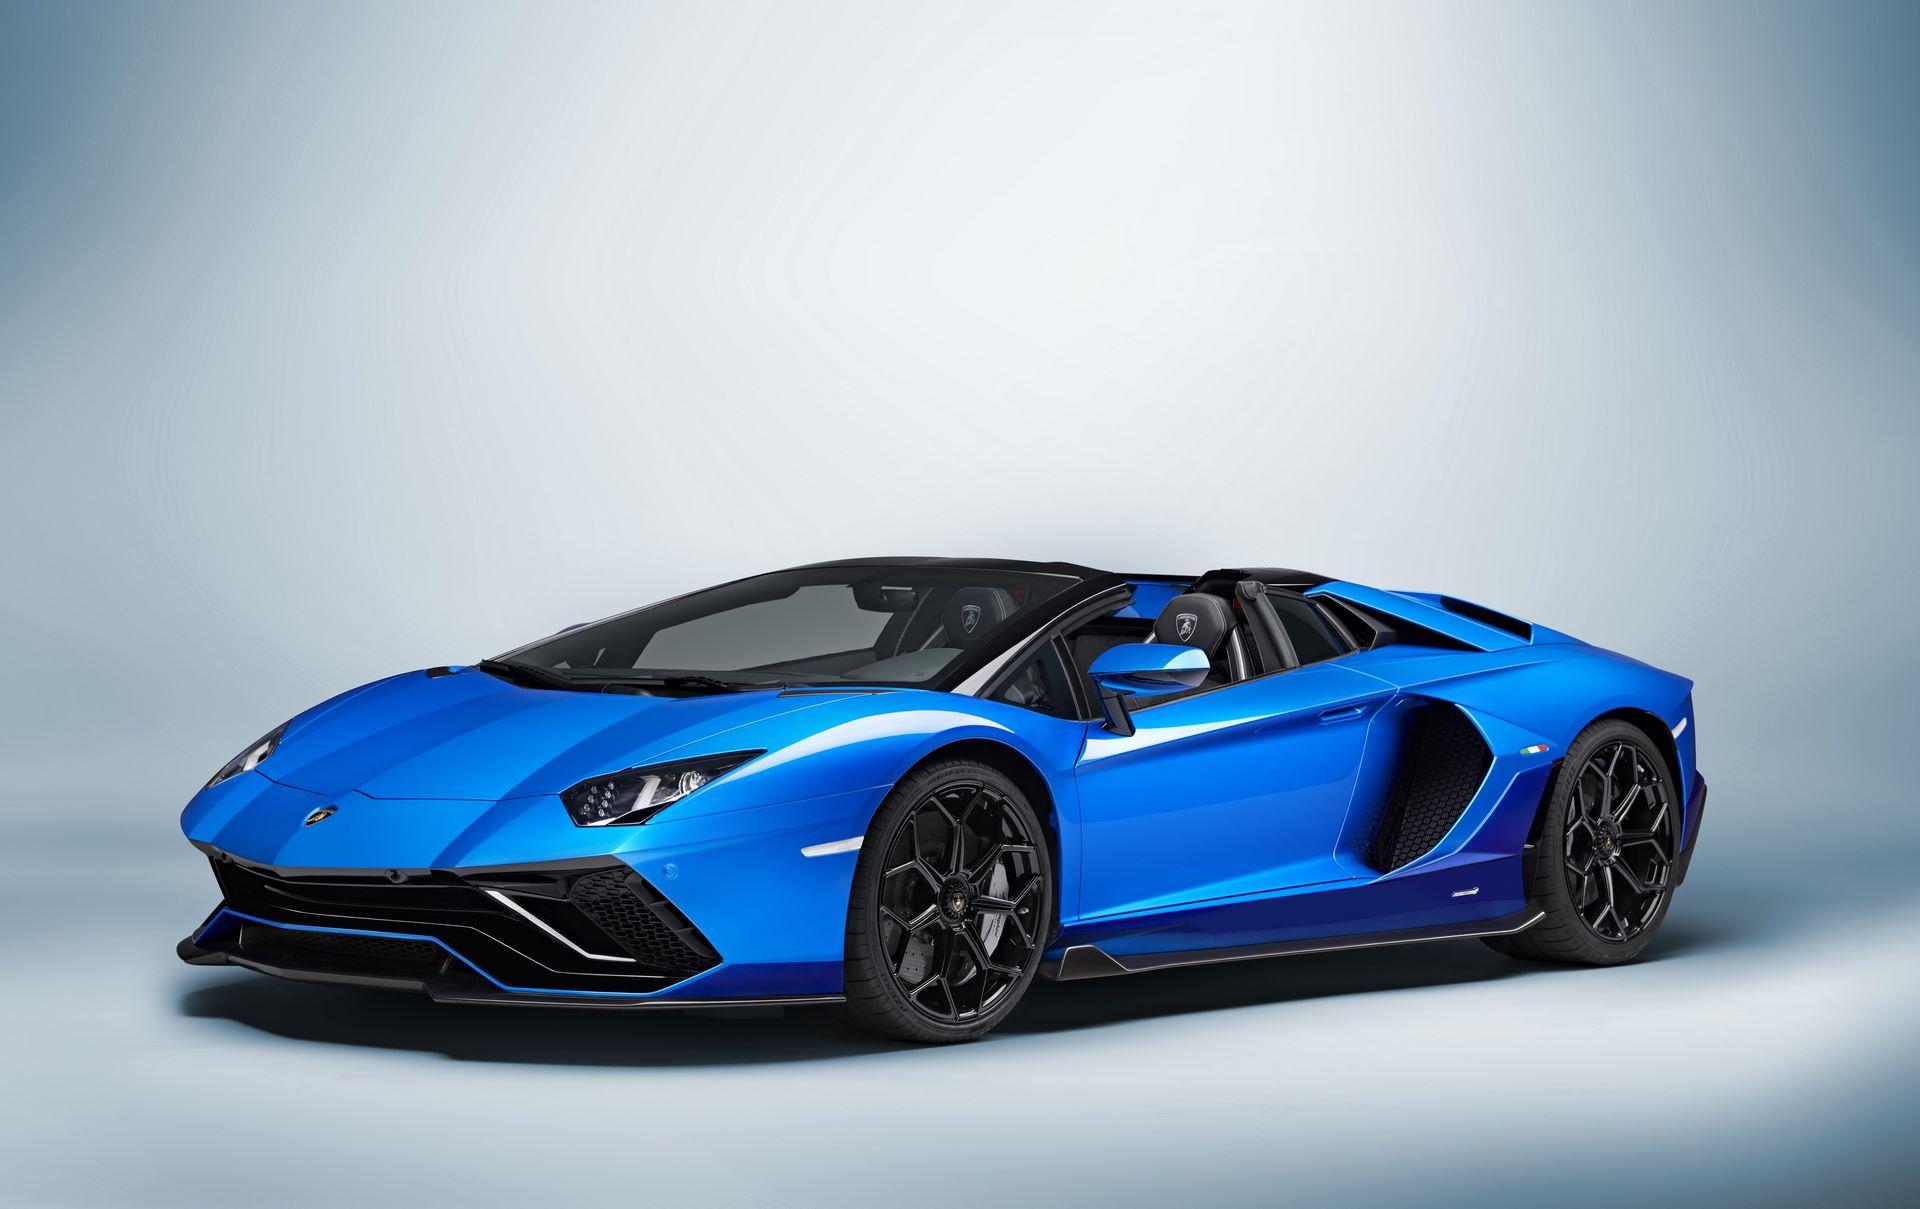 Lamborghini-Aventador-LP780-4-Ultimae-39